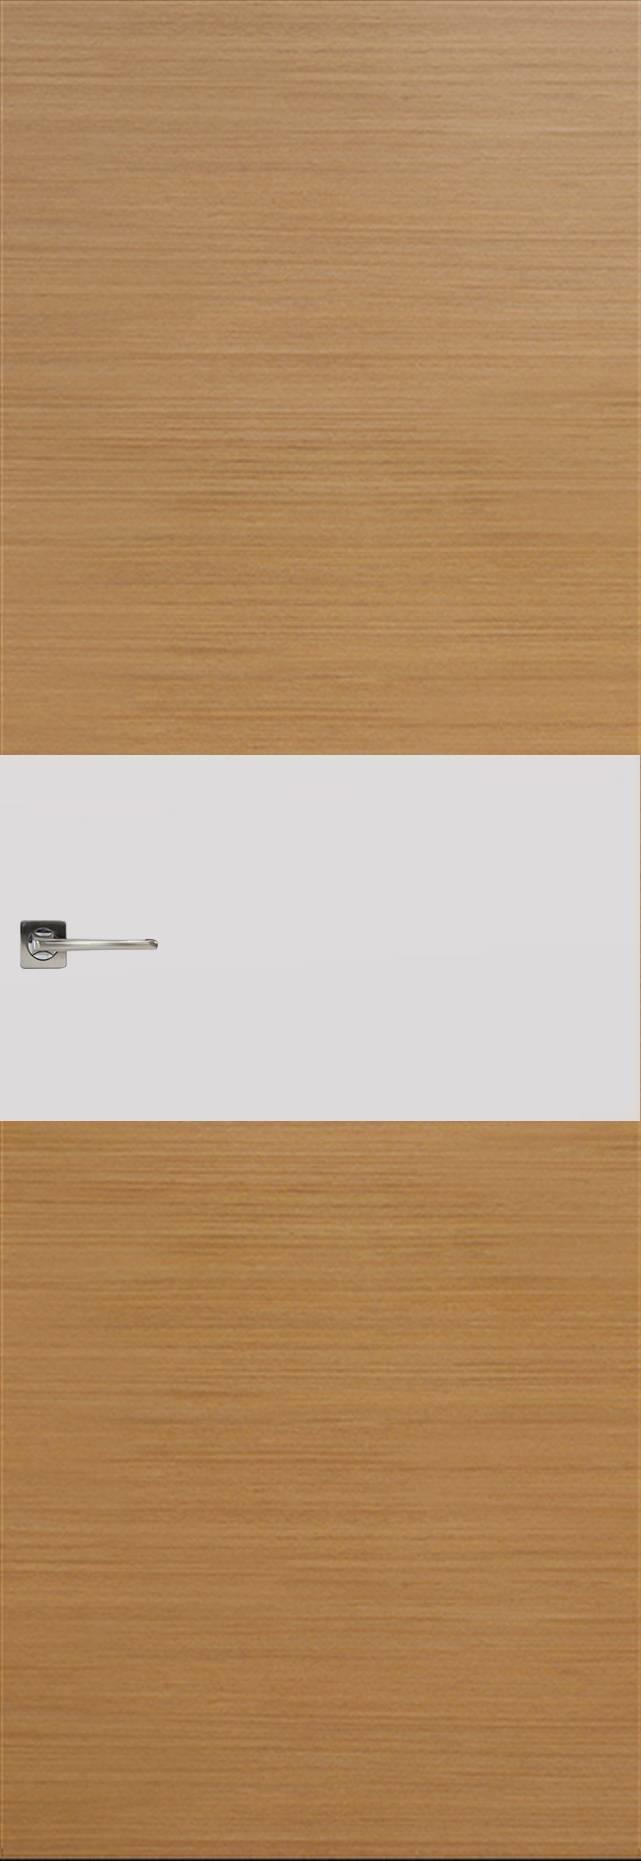 Tivoli Е-4 Невидимка цвет - Миланский орех Без стекла (ДГ)